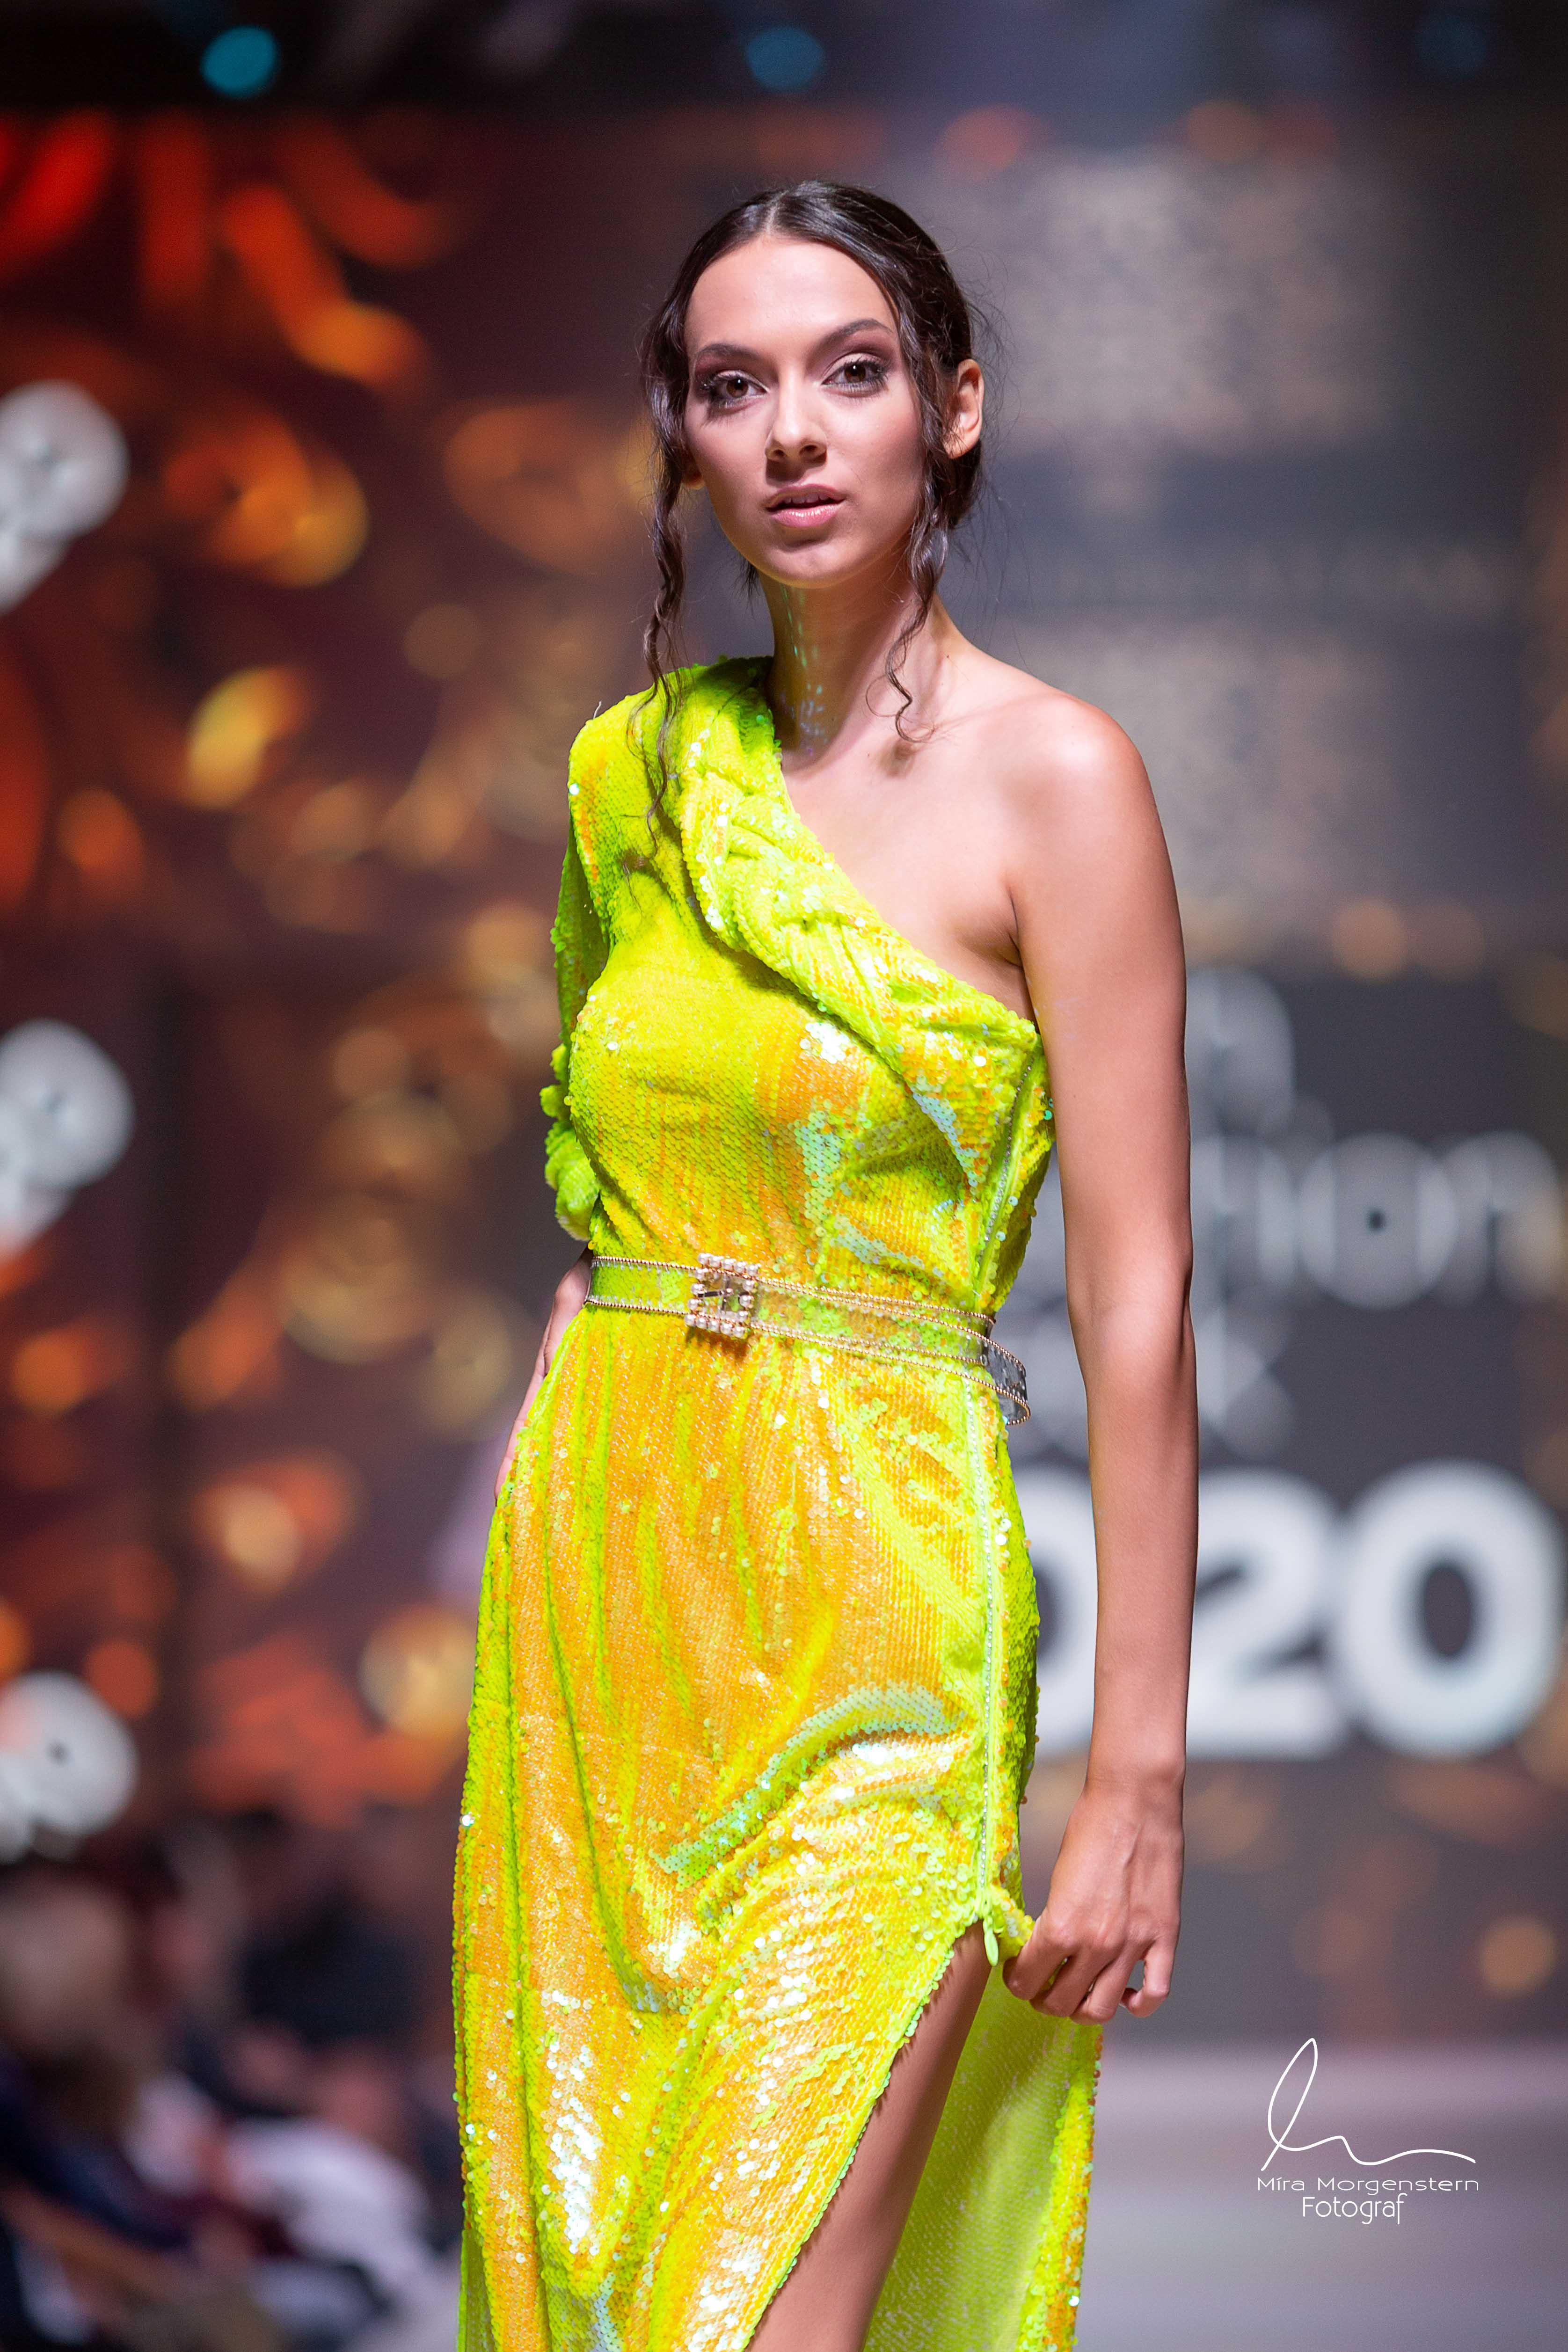 Czech Fashion Week